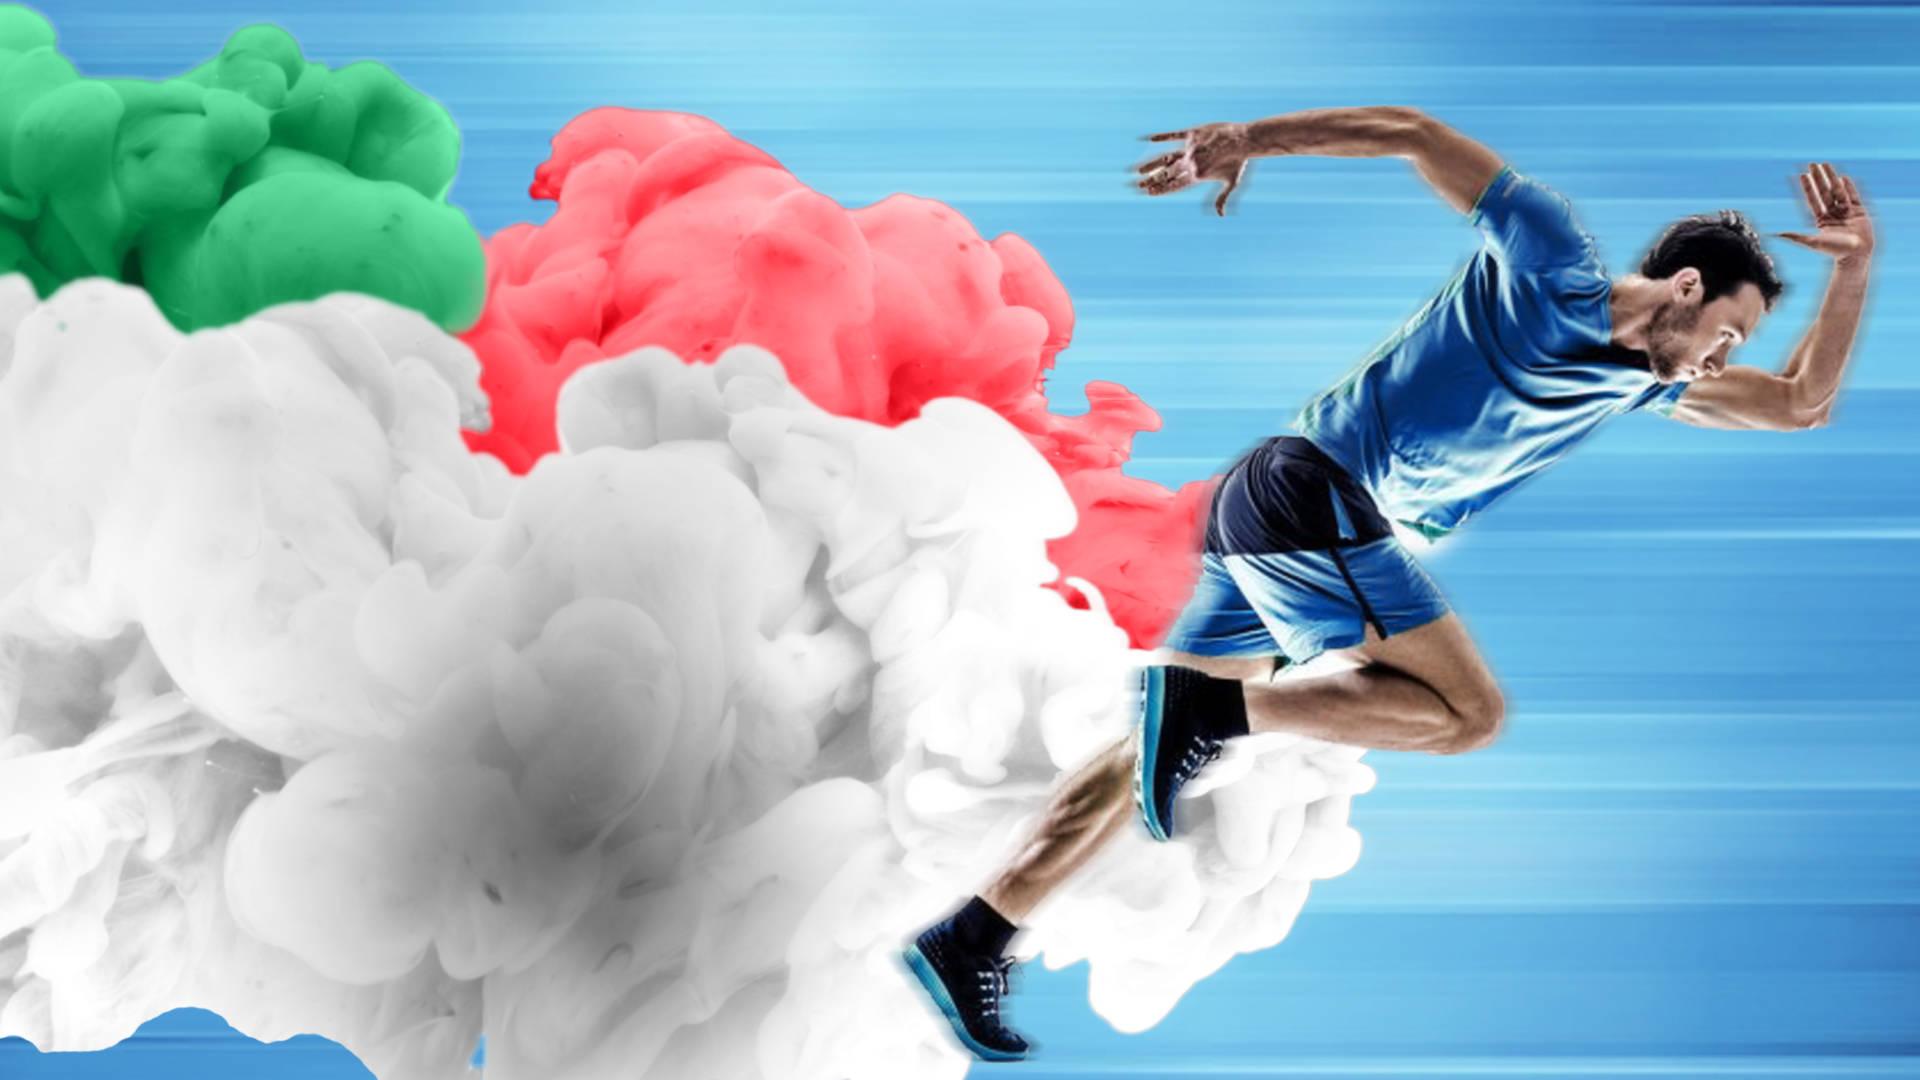 Ripartire dal Cloud Made in Italy, l'evento online il 24/9 h. 15,30